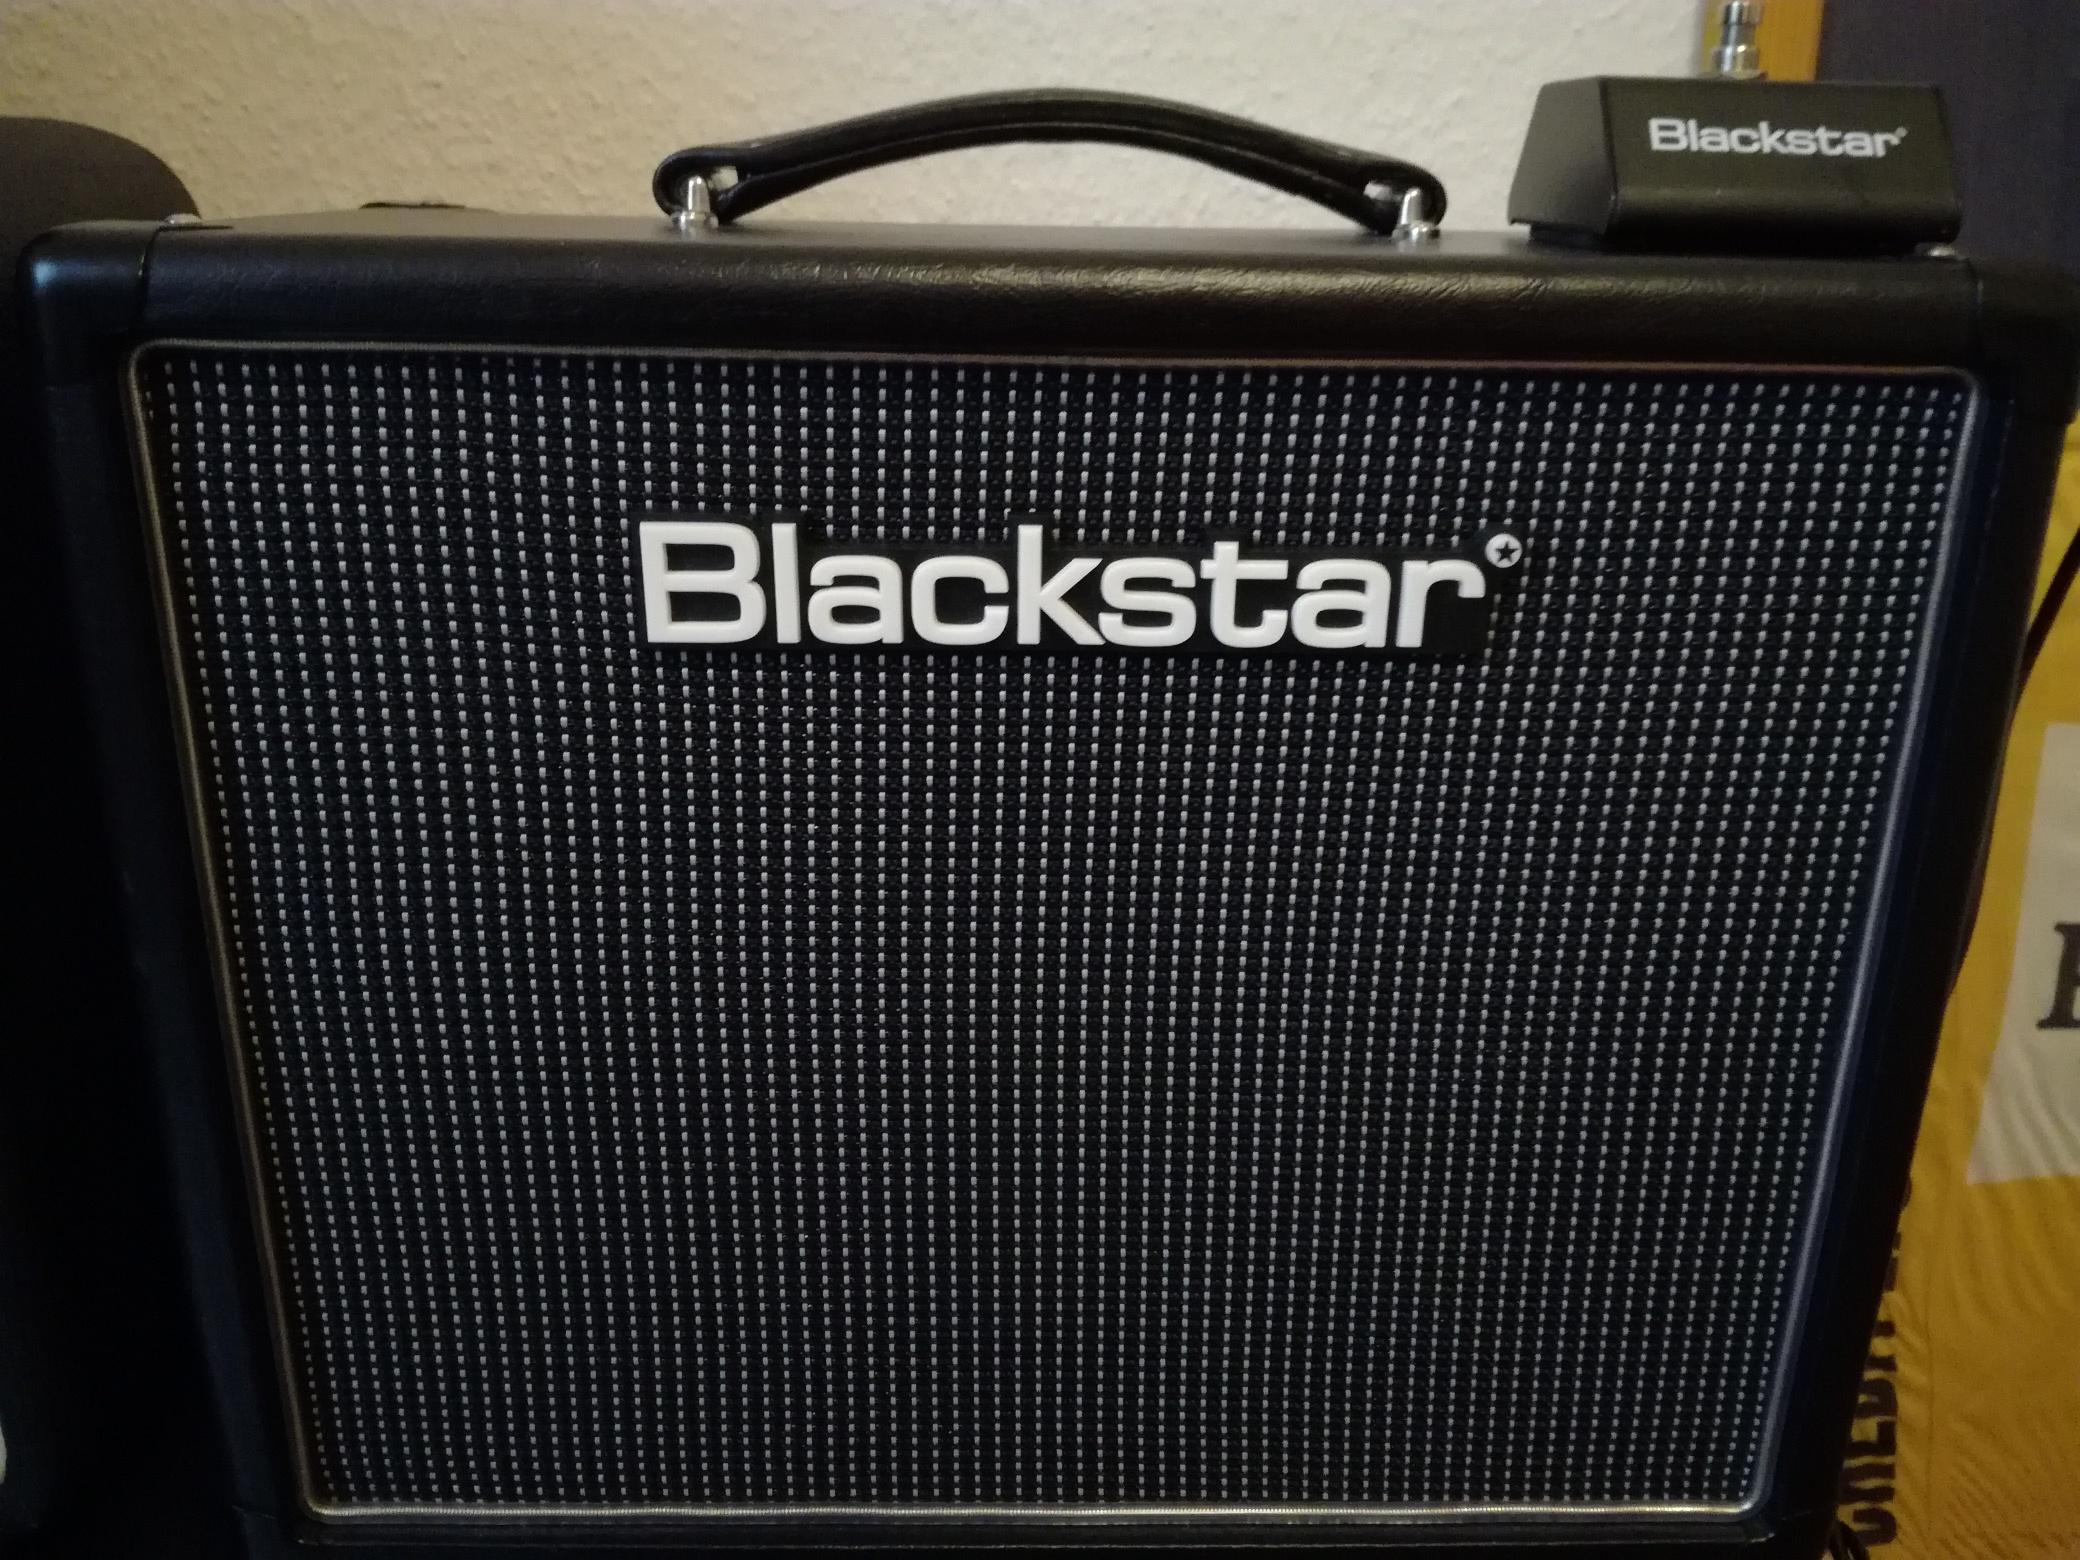 blackstar amplification ht 5r image 2025910 audiofanzine. Black Bedroom Furniture Sets. Home Design Ideas